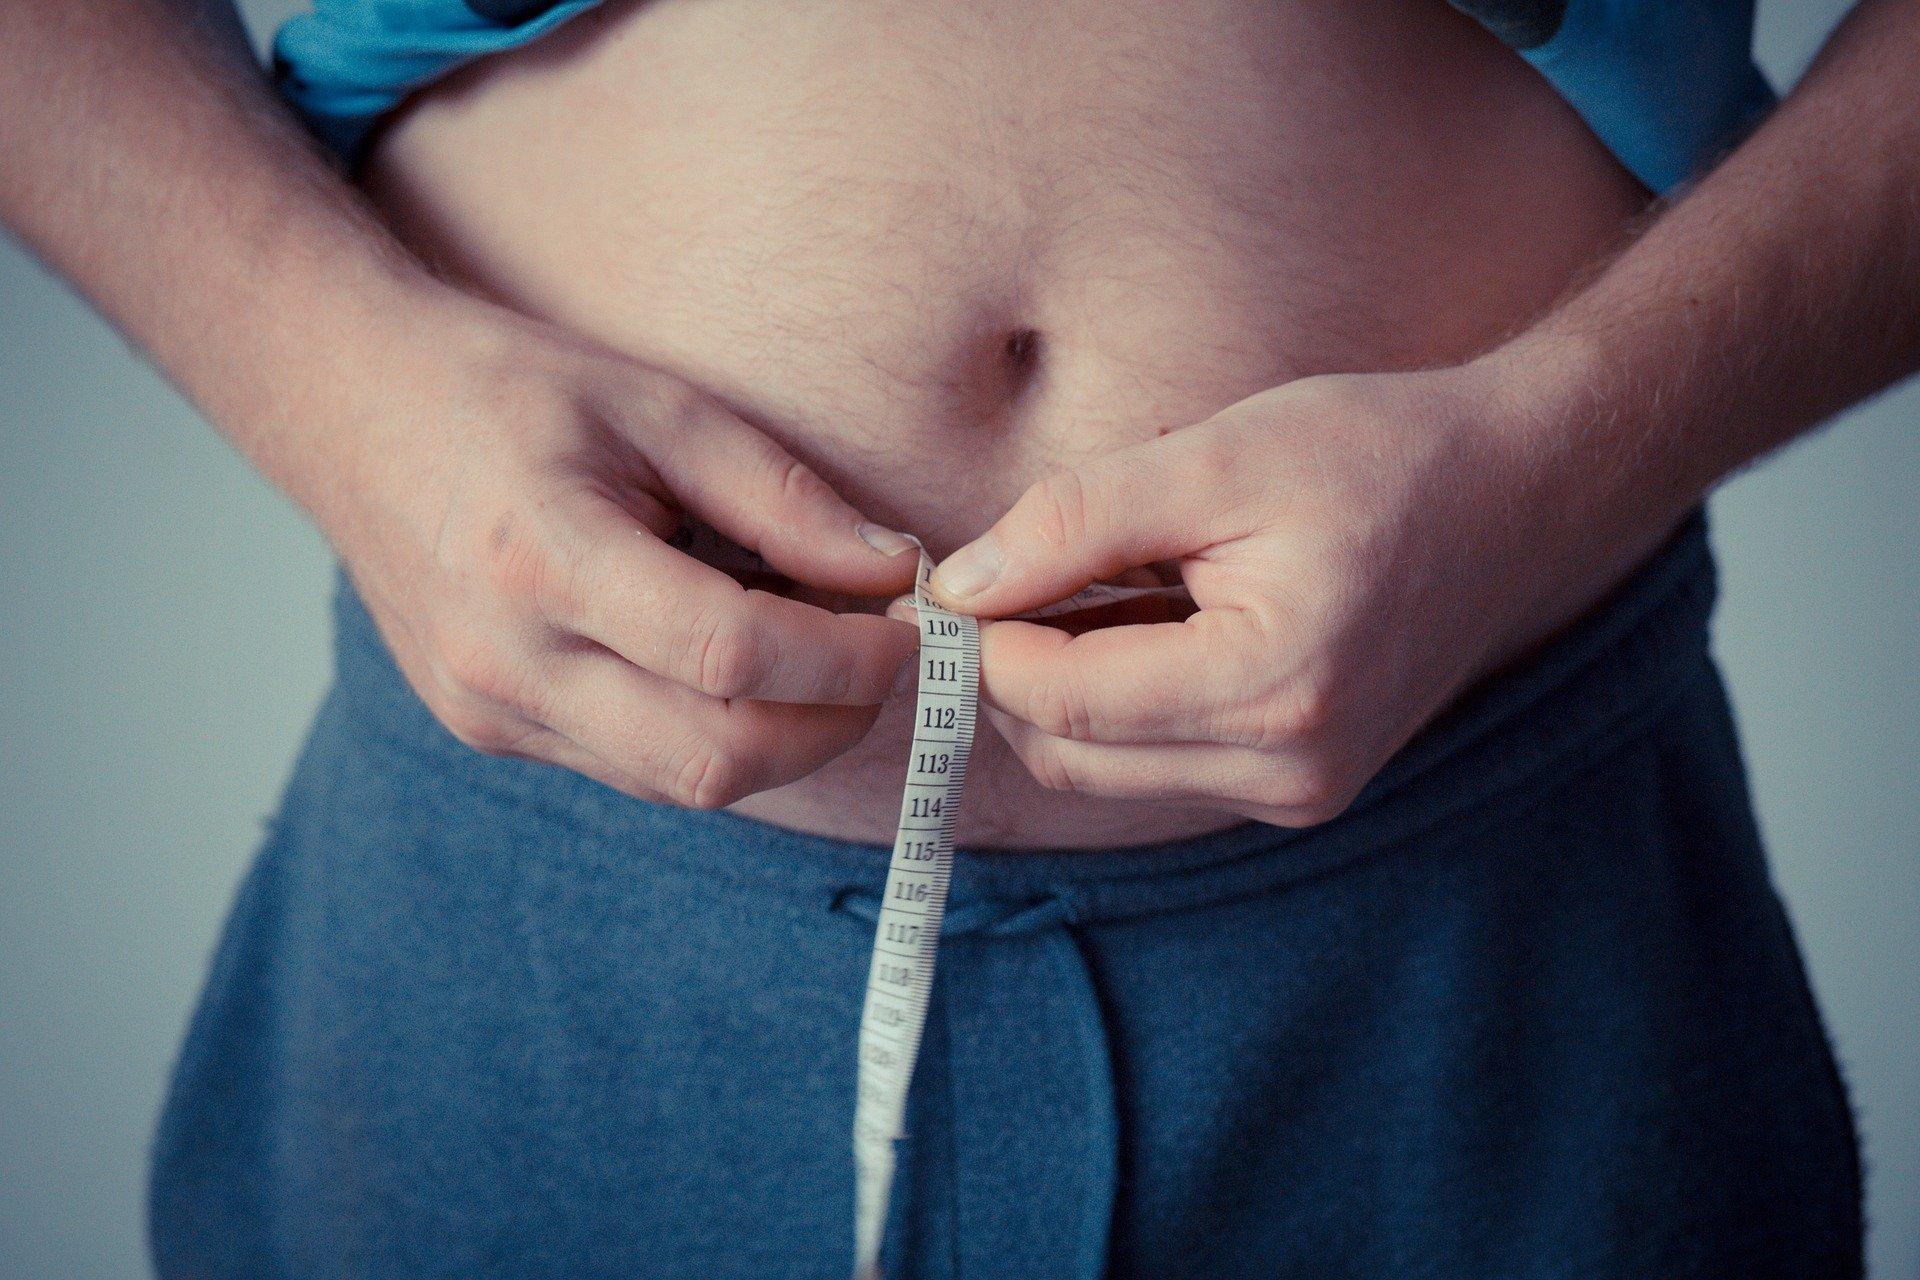 A man measure's his waist.